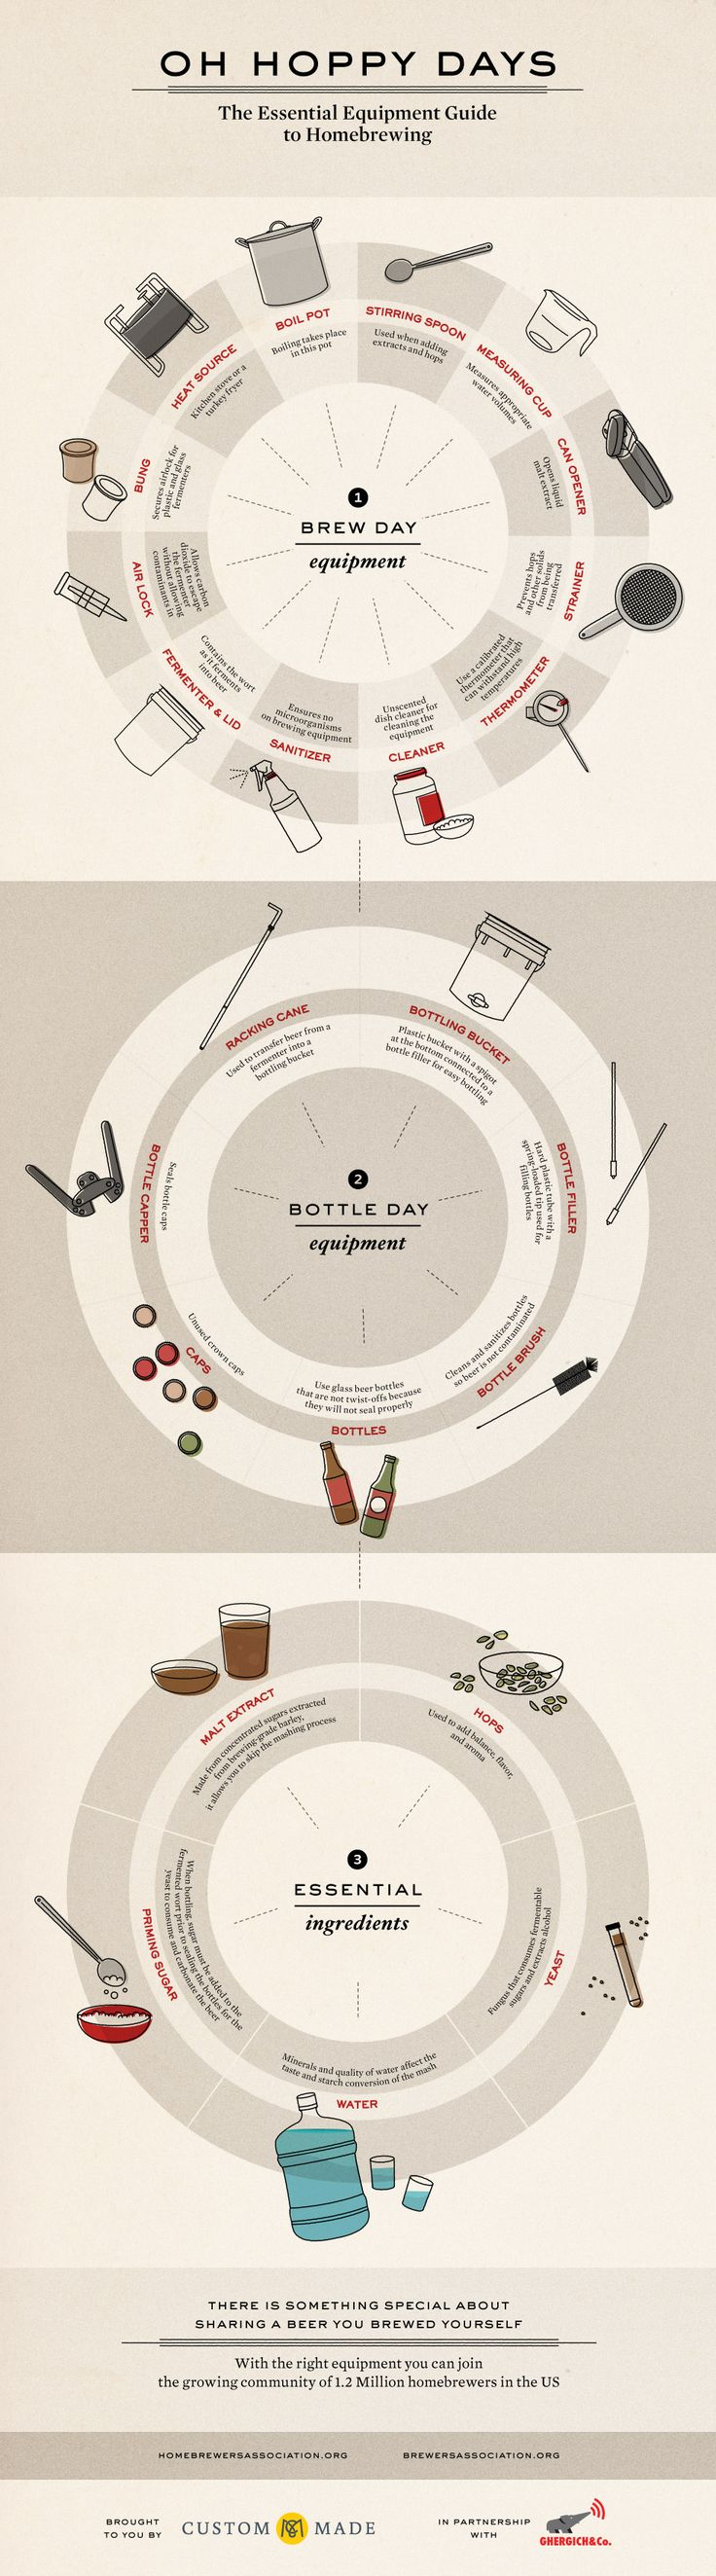 Oh Hoppy Days: The Essential Equipment Guide to Homebrewing   CustomMade.com via @CustomMade